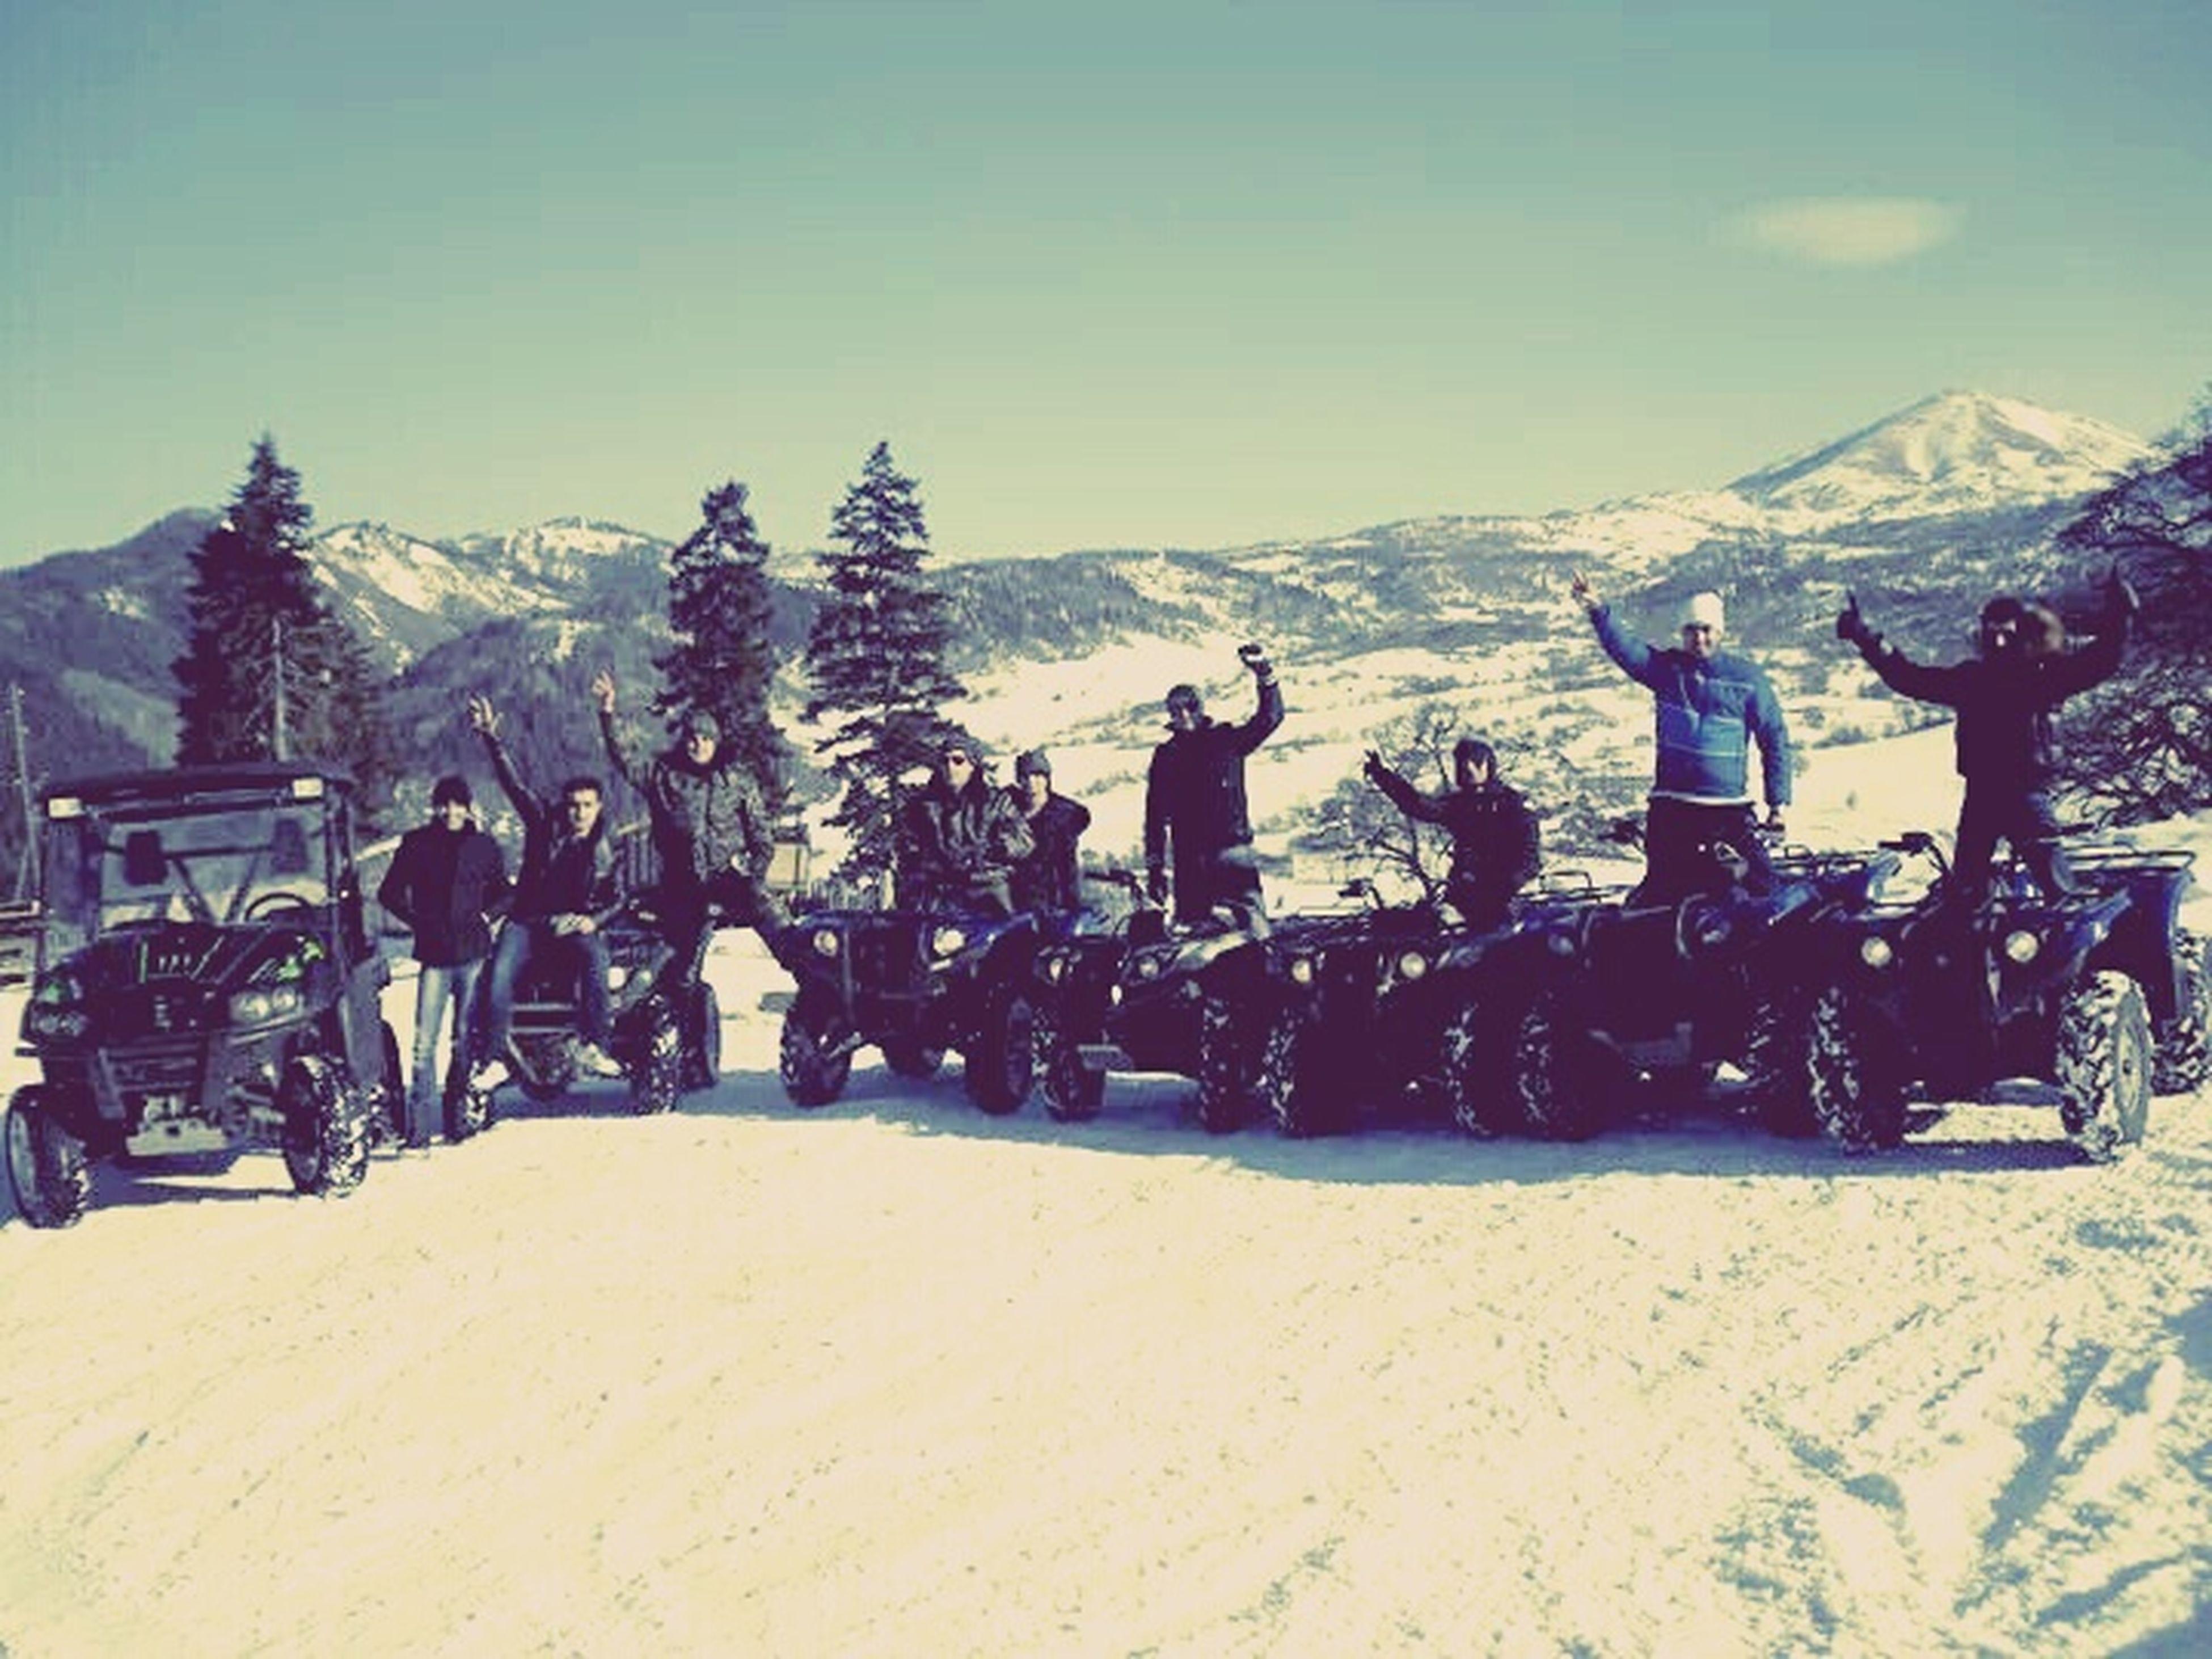 mountain, snow, winter, cold temperature, mountain range, sky, large group of people, leisure activity, landscape, men, lifestyles, snowcapped mountain, scenics, vacations, travel, season, tourism, nature, tourist